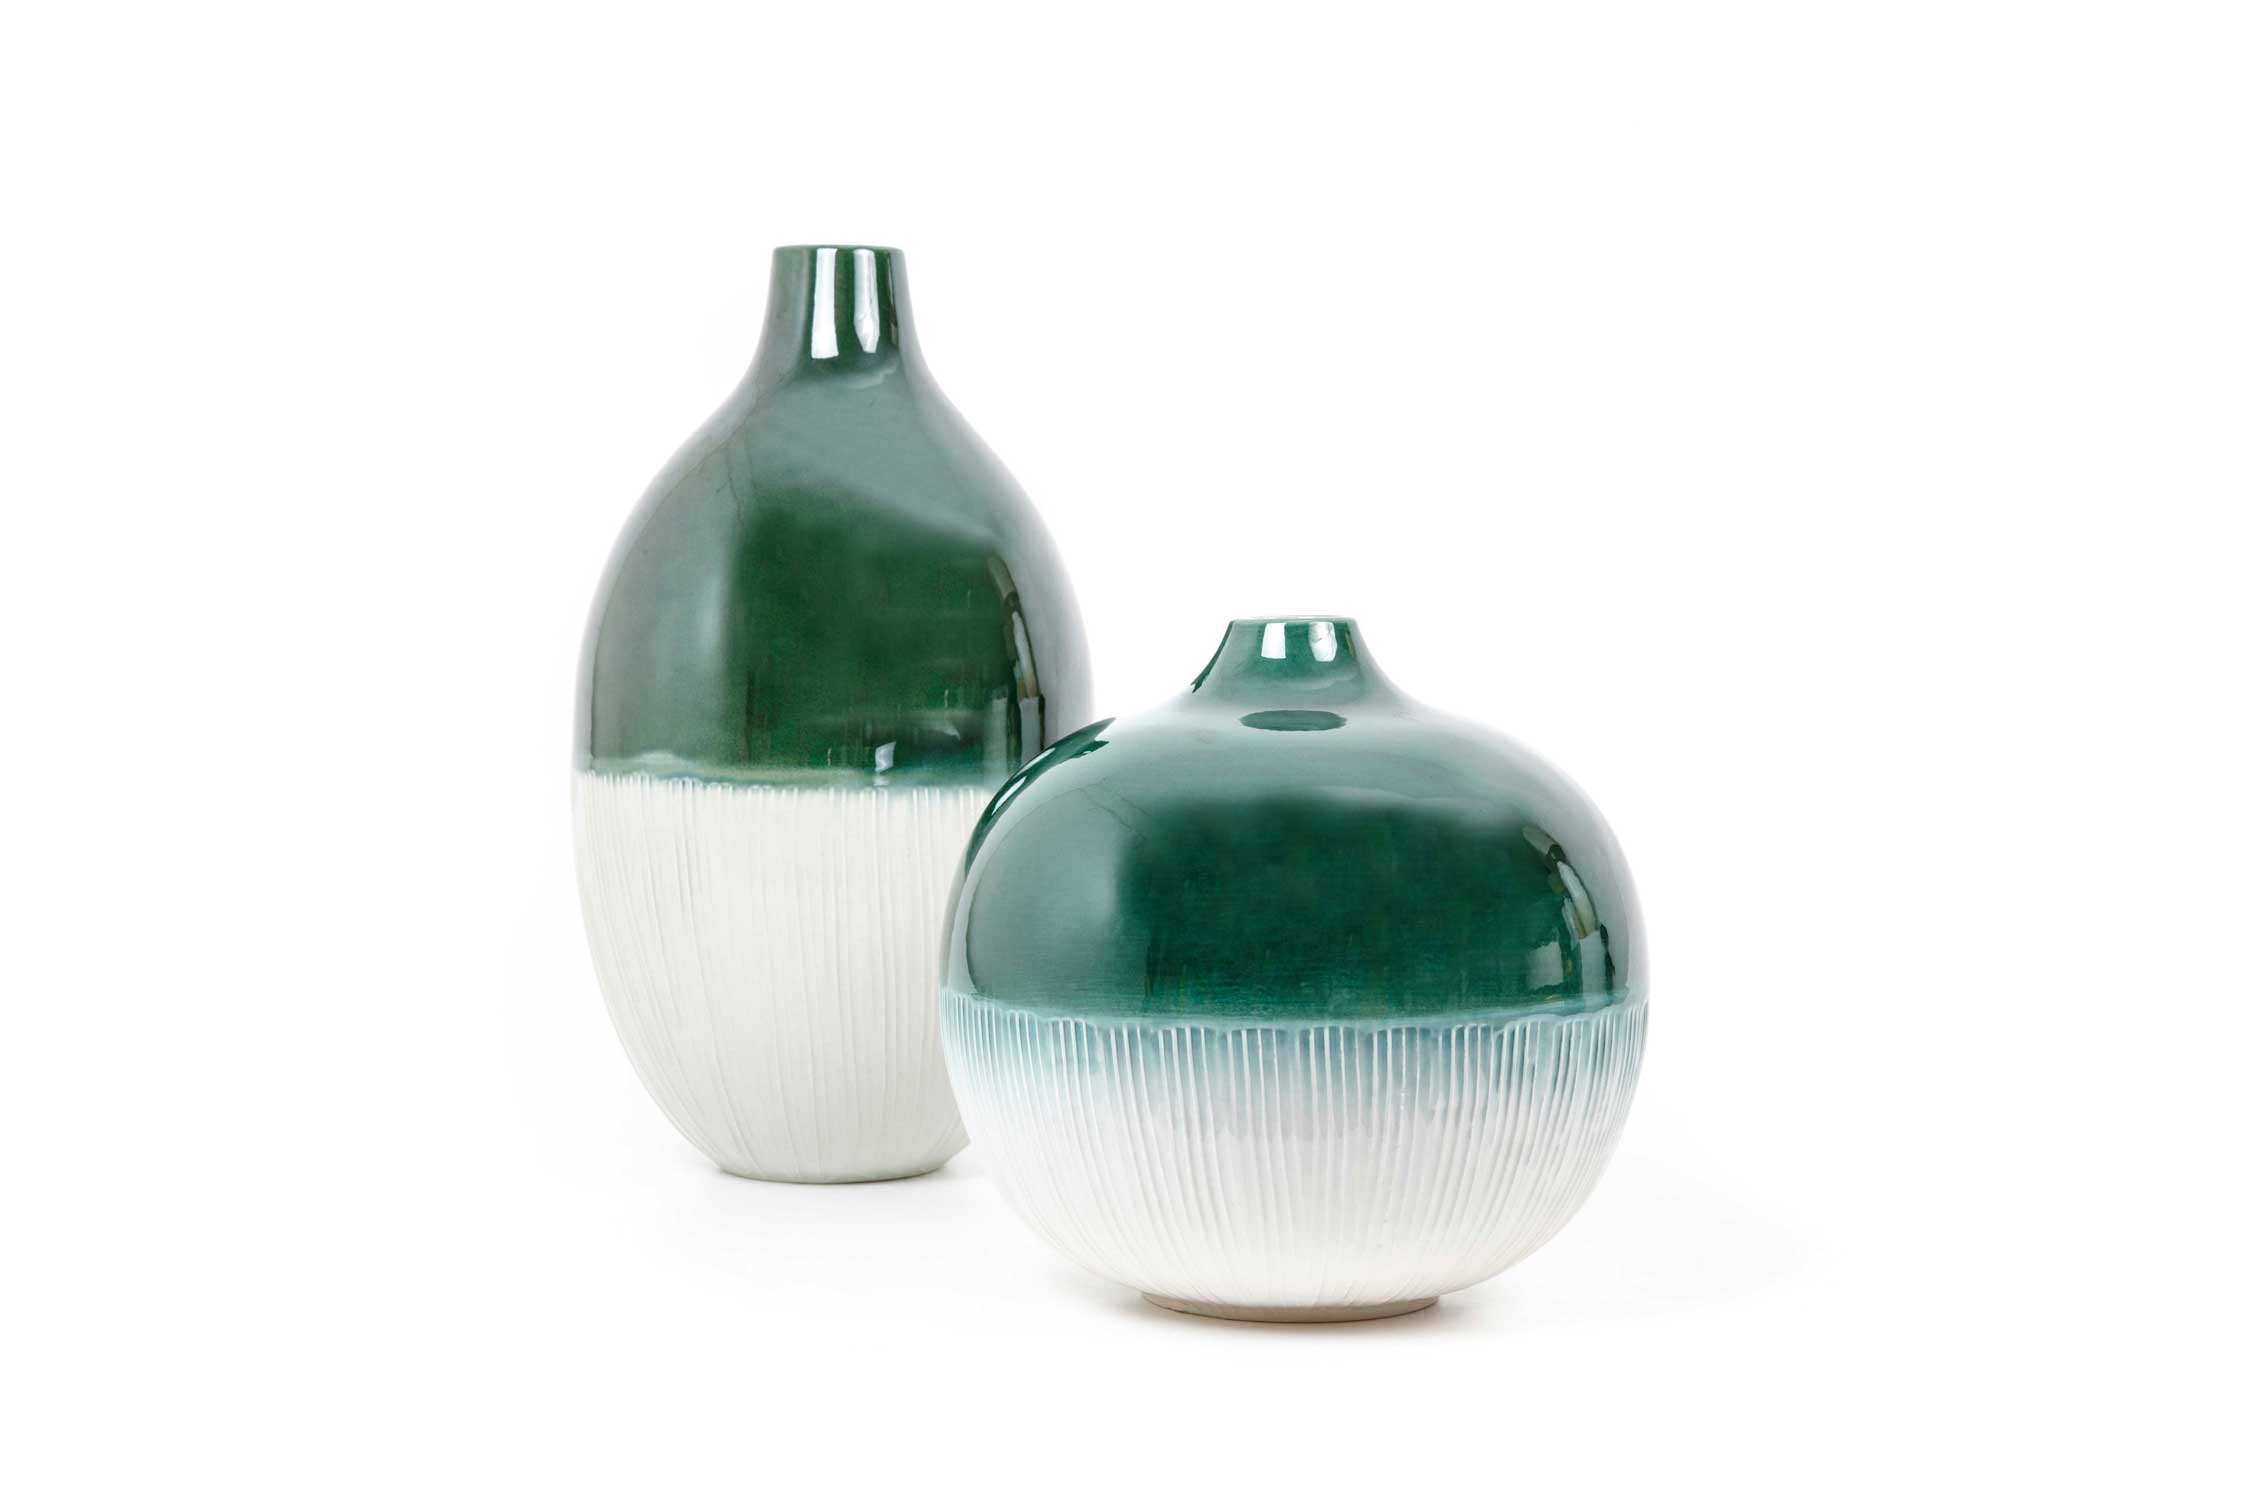 Ballon vase